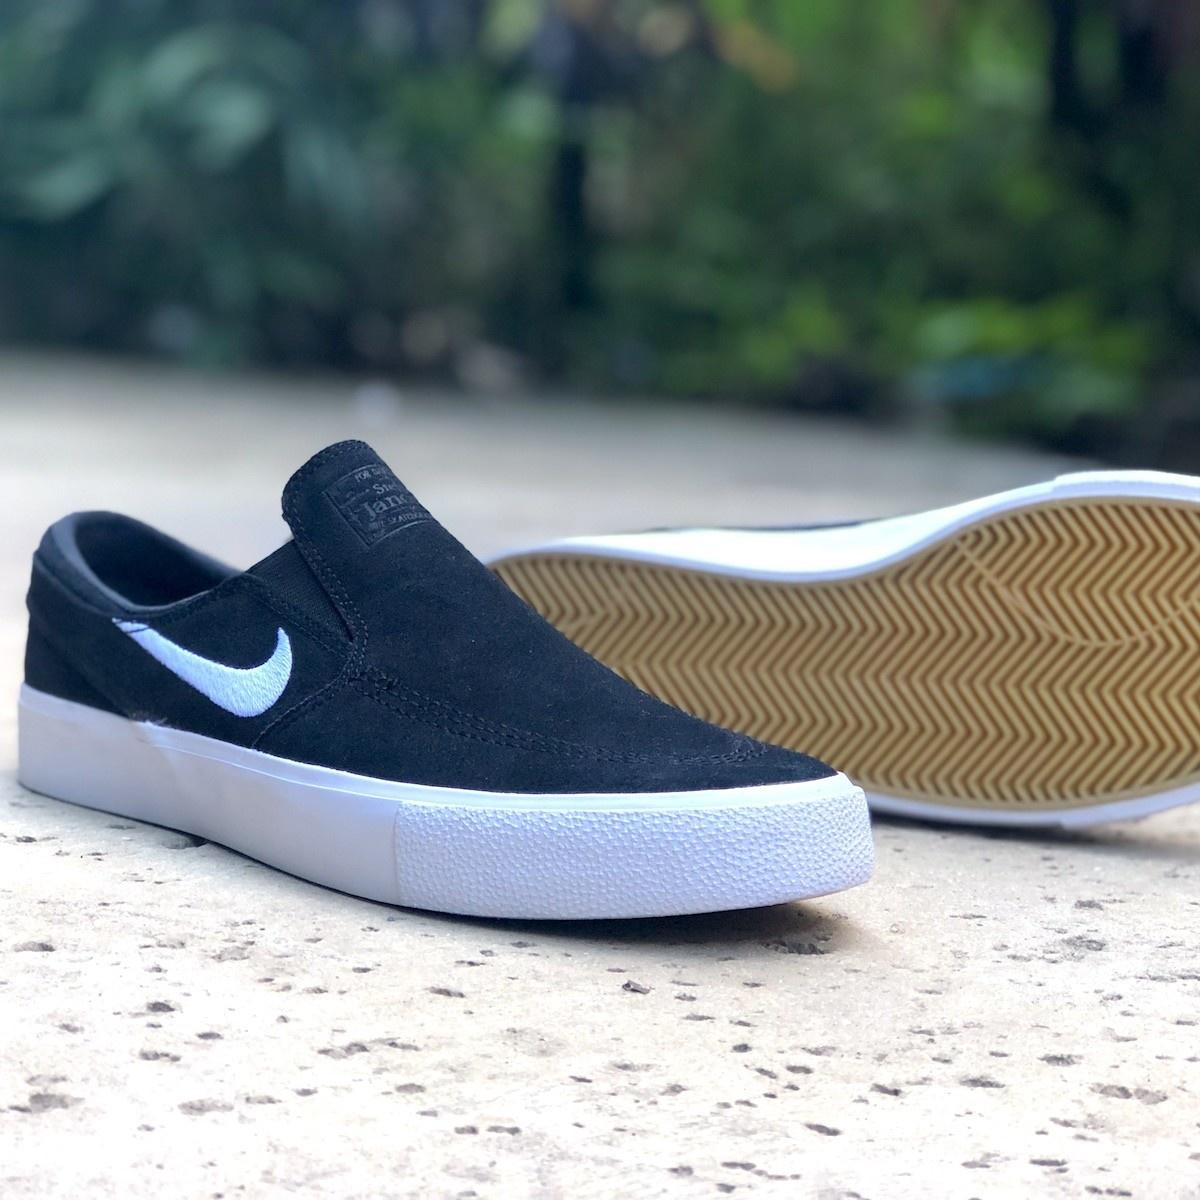 vast selection buying now special sales Nike SB Zoom Janoski Slip RM Black/White